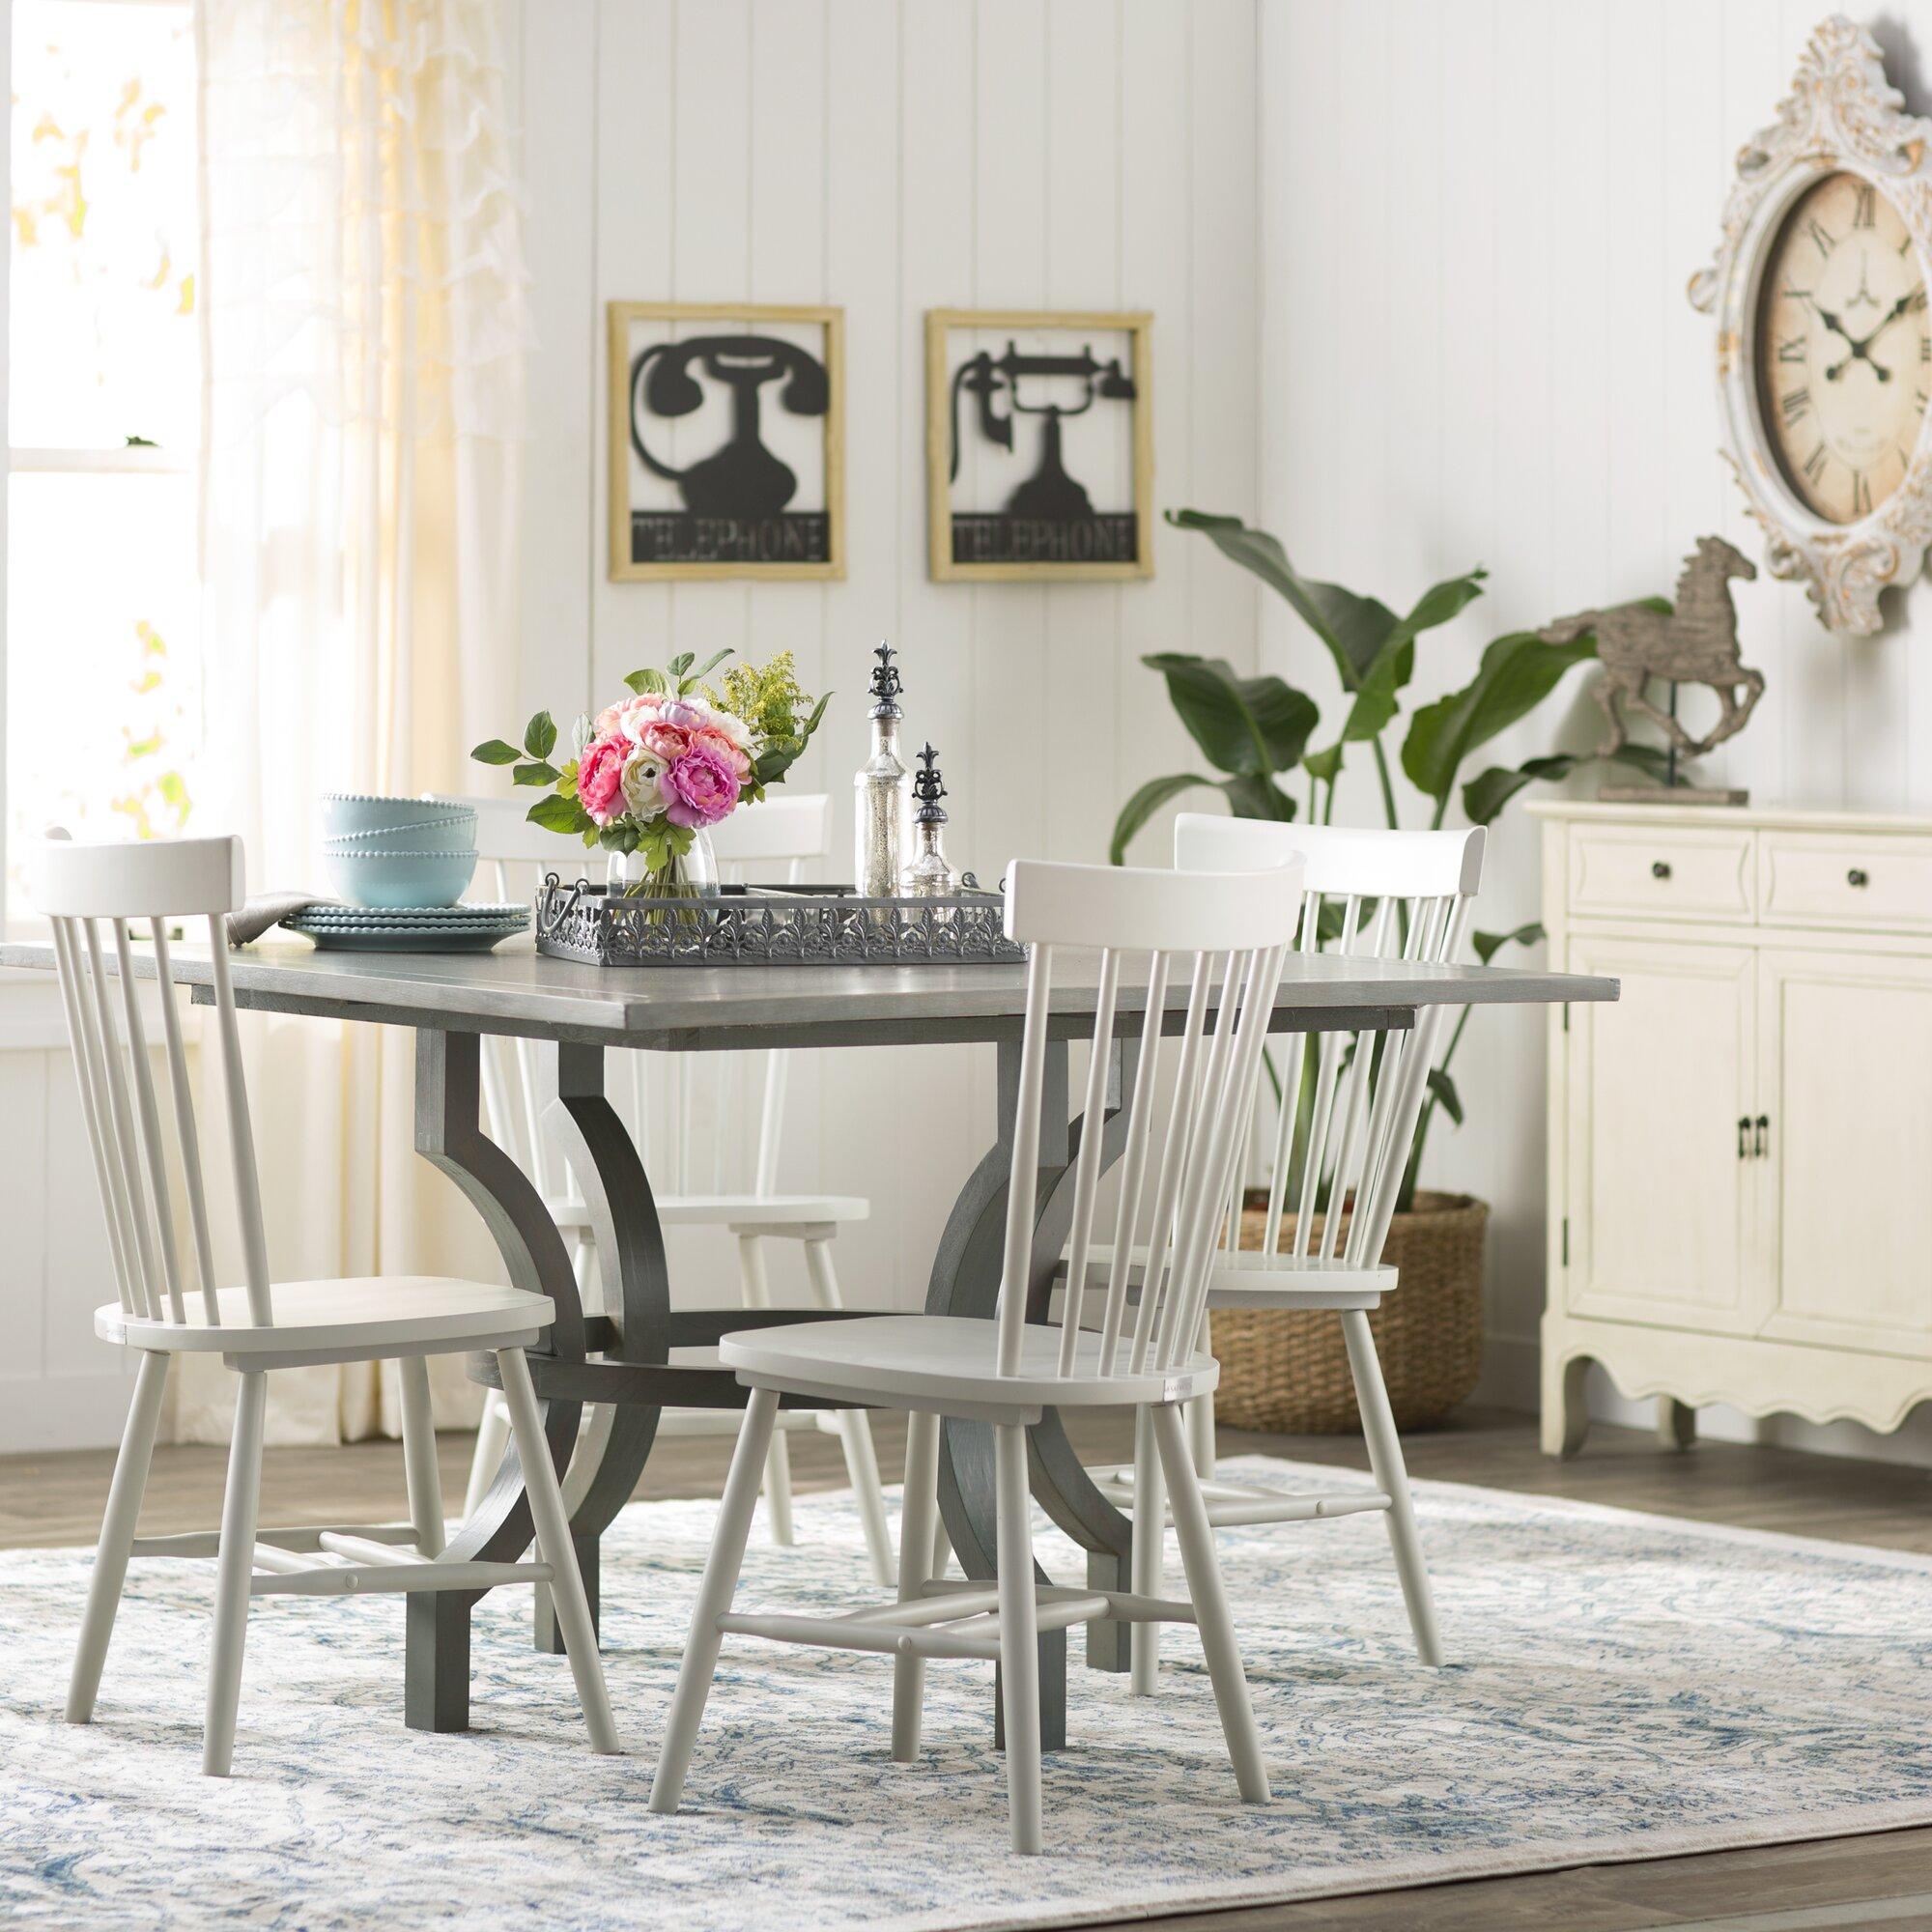 Lark manor merignac 3 piece decorative jar set reviews wayfair - Decor discount montelimar ...